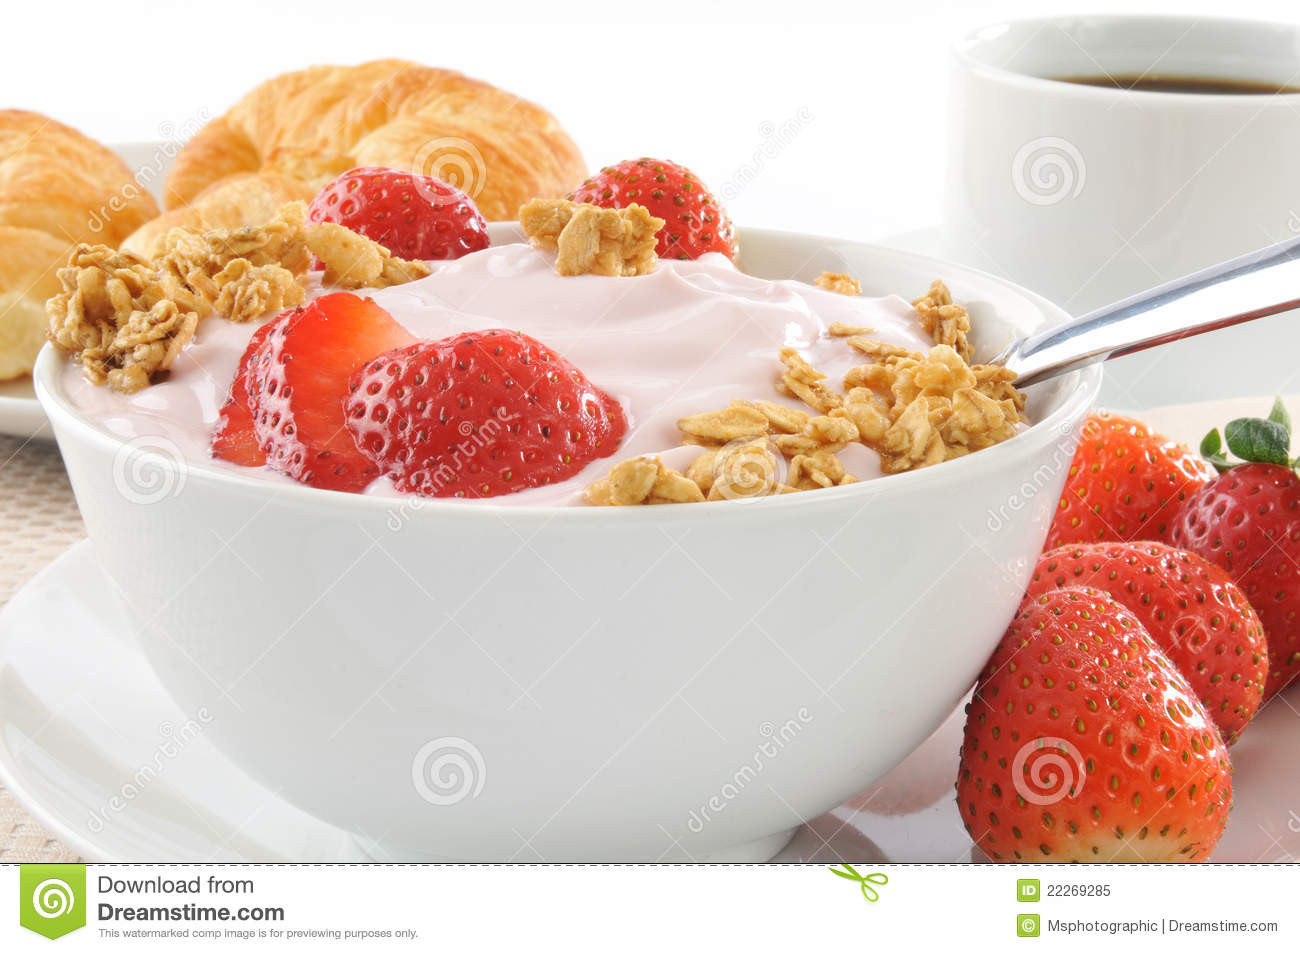 Healthy Low Fat Breakfast  Healthy Low Fat Breakfast Royalty Free Stock Image